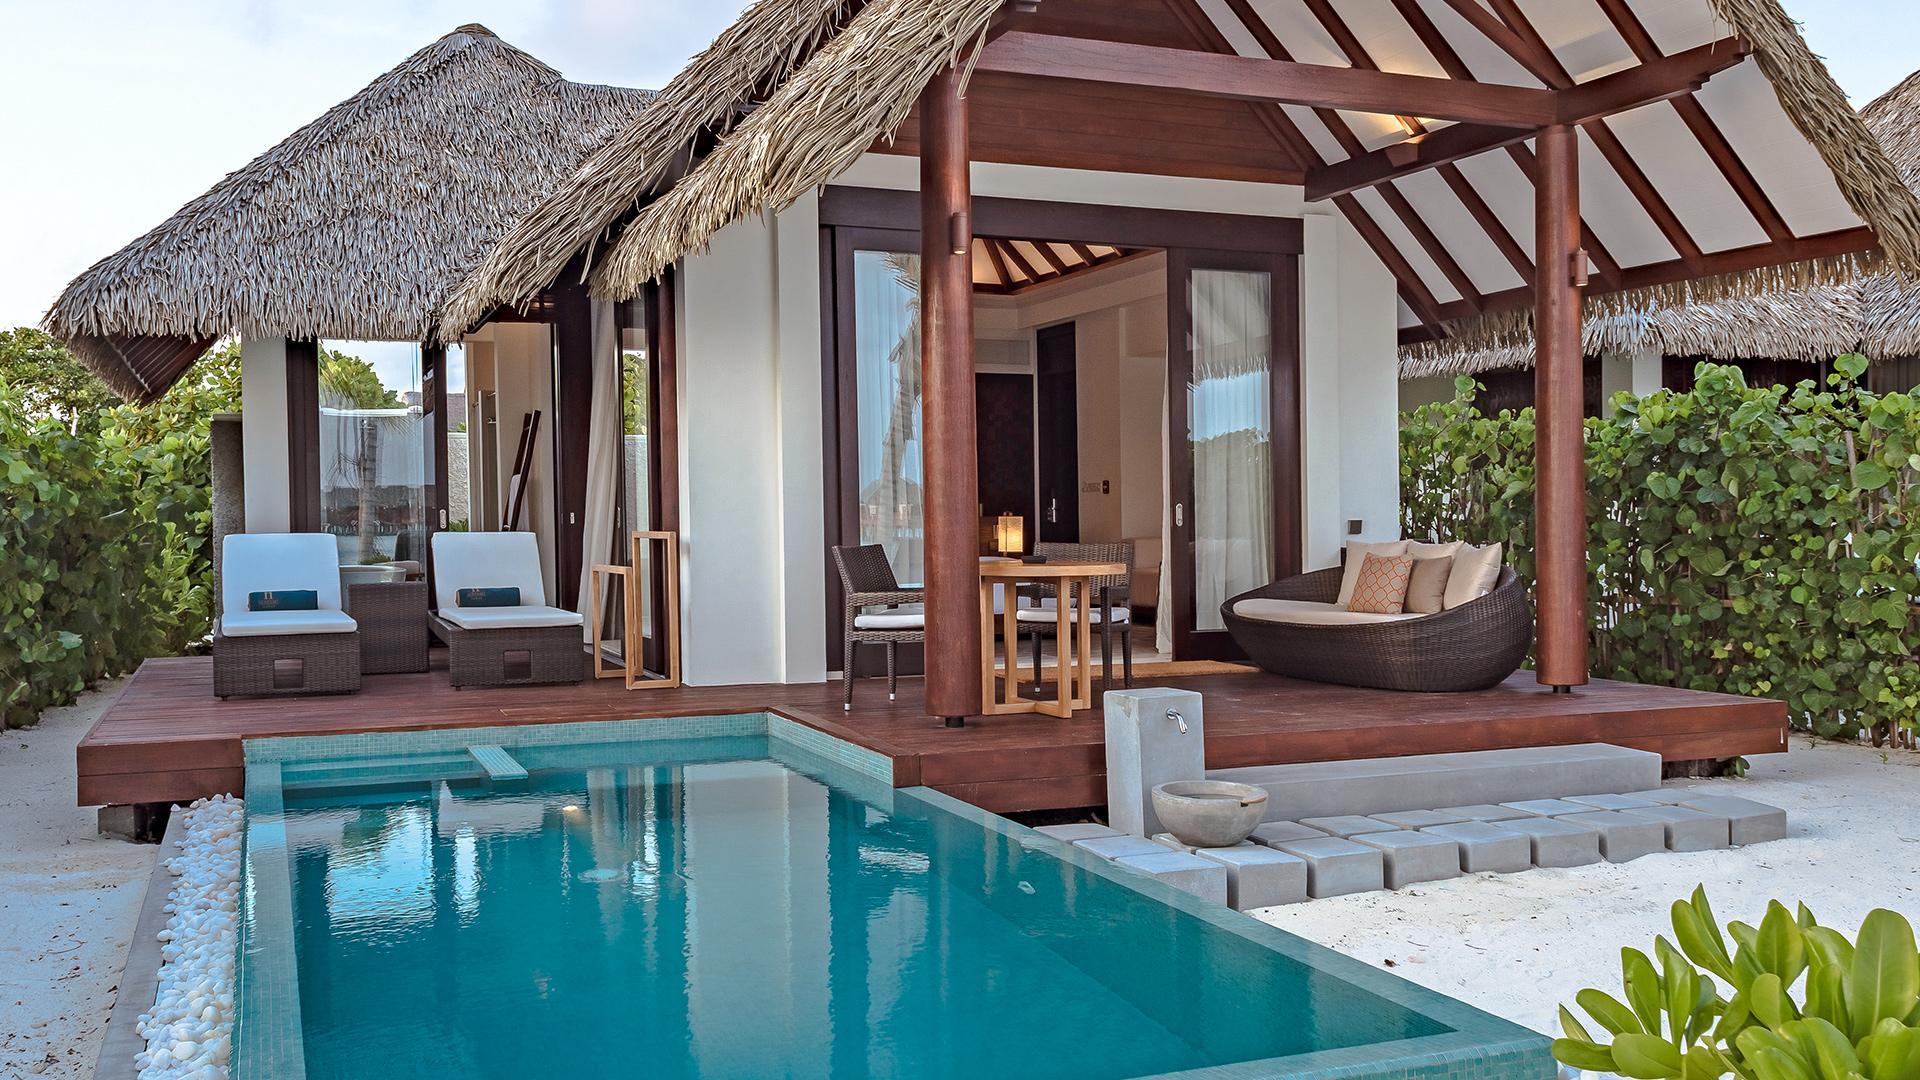 Pool Beach Villa image 1 at Heritance Aarah by null, North Province, Maldives